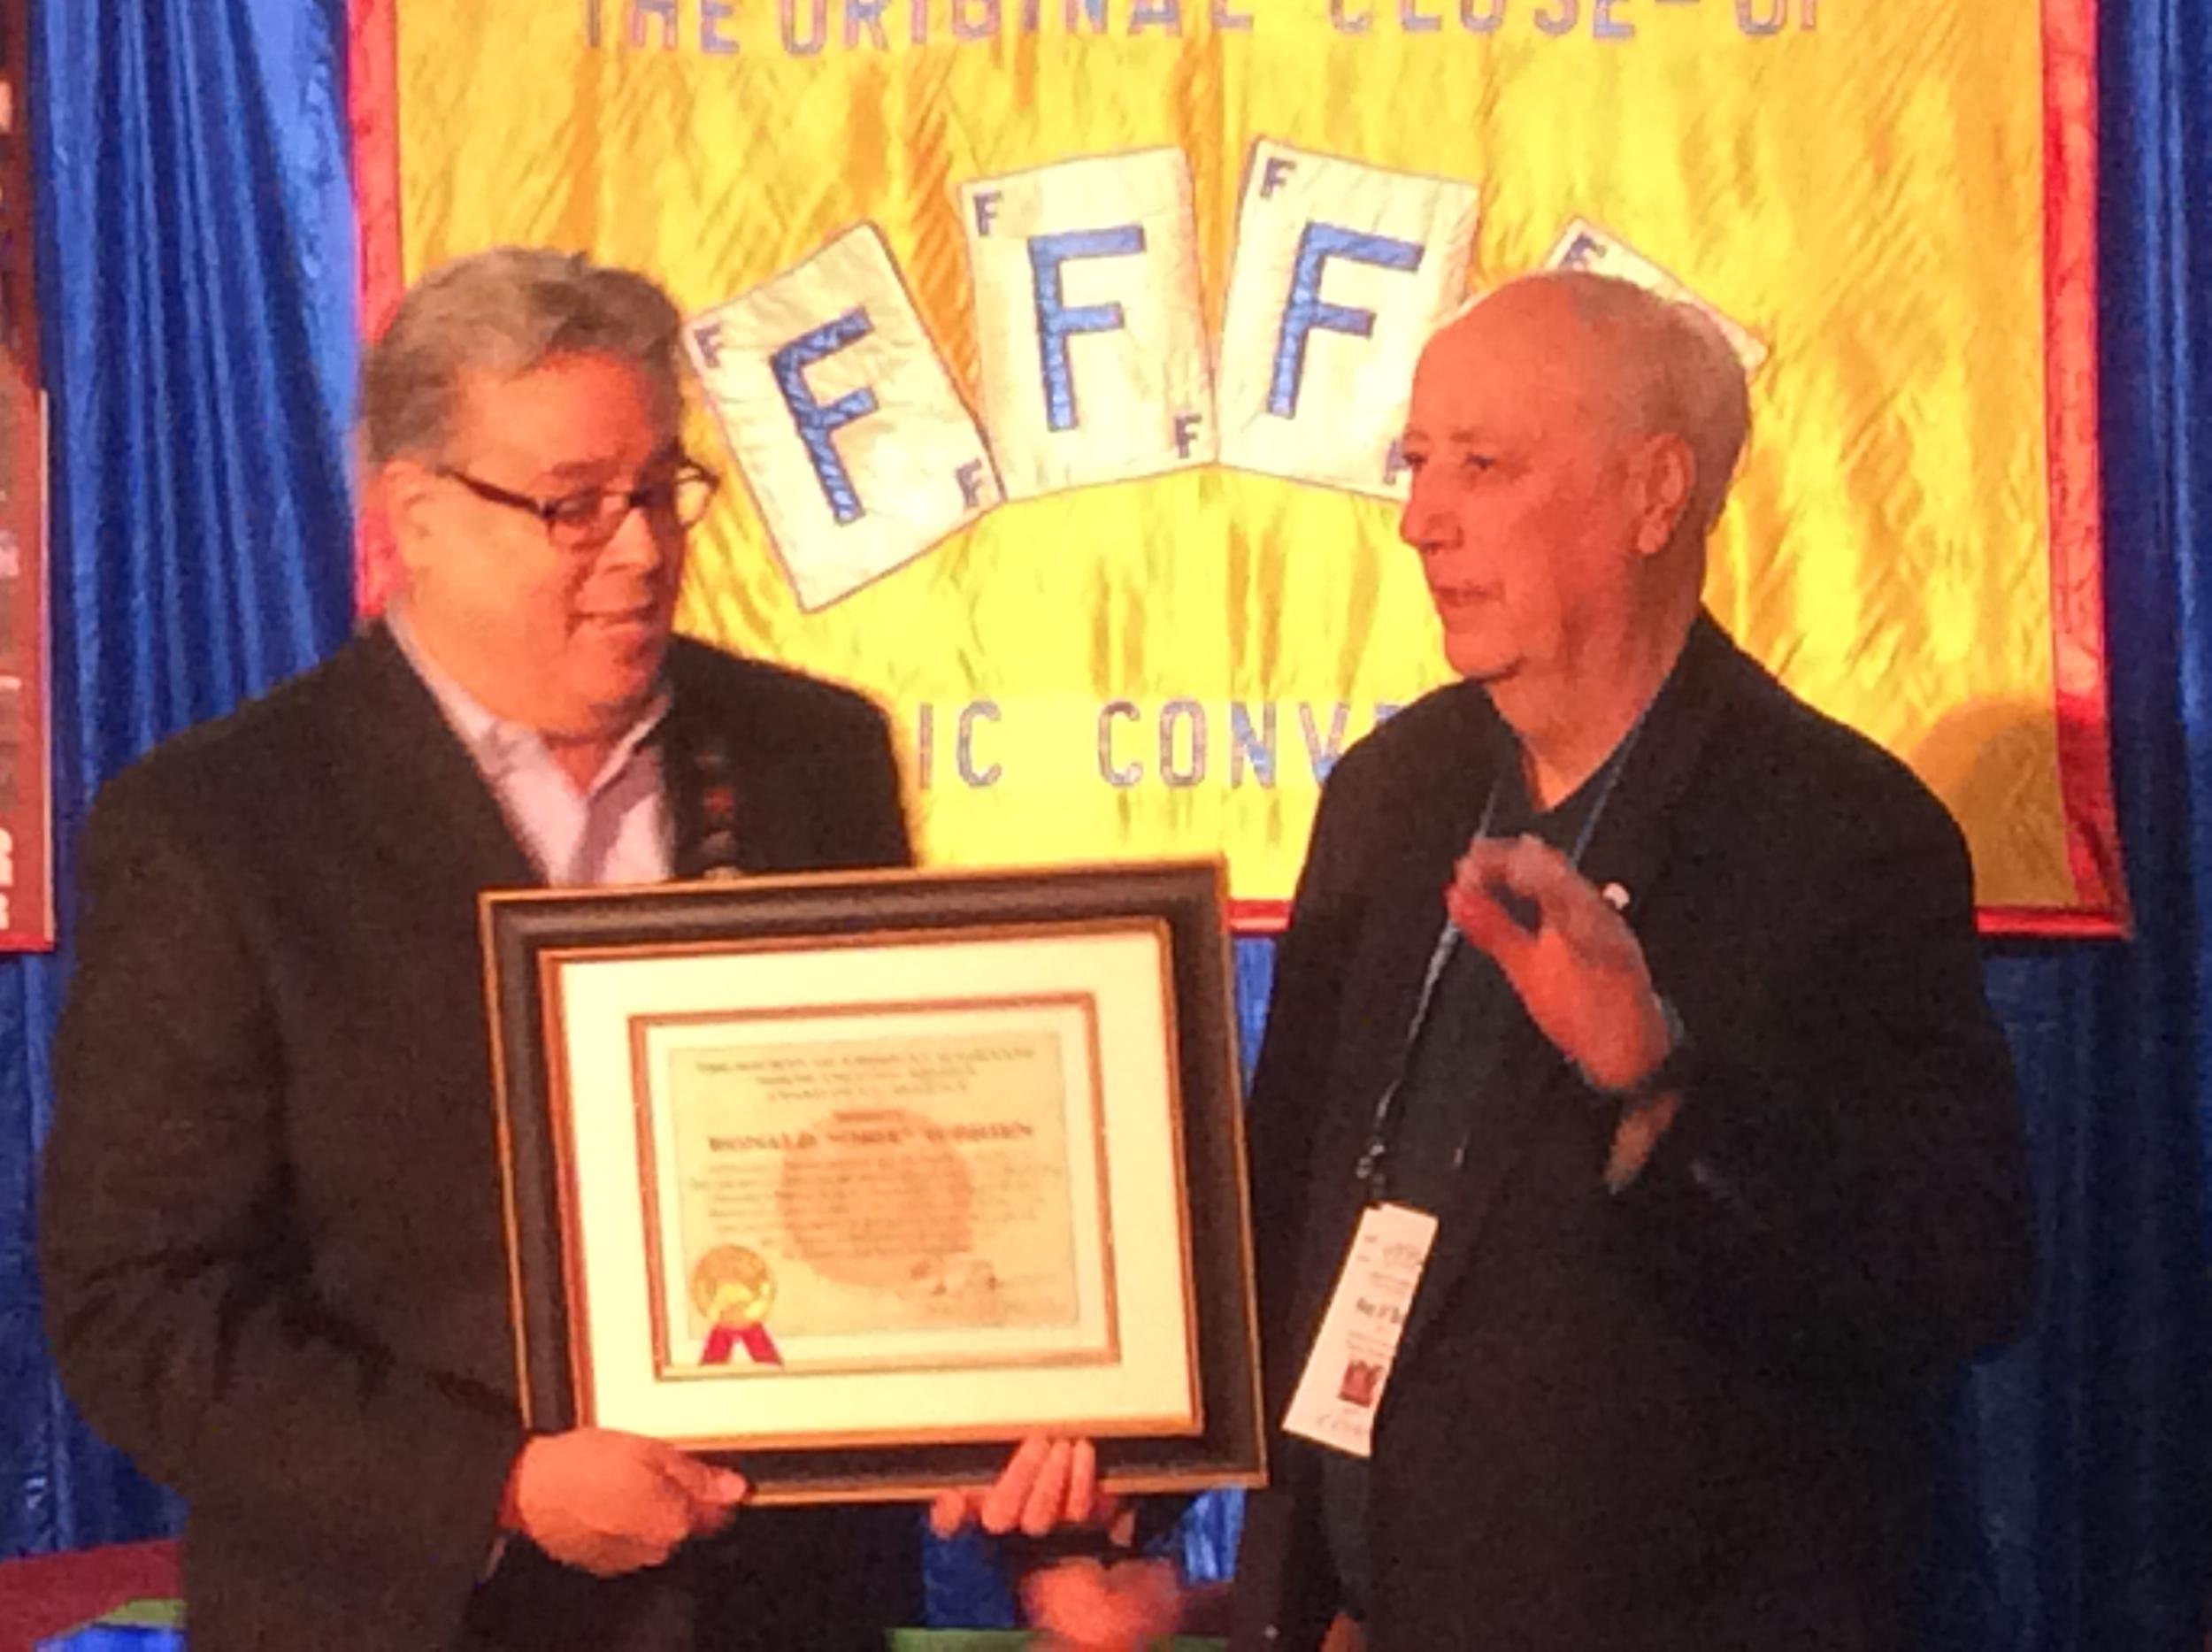 Eric DeCamps presents S.A.M. award to Obie O'Brien